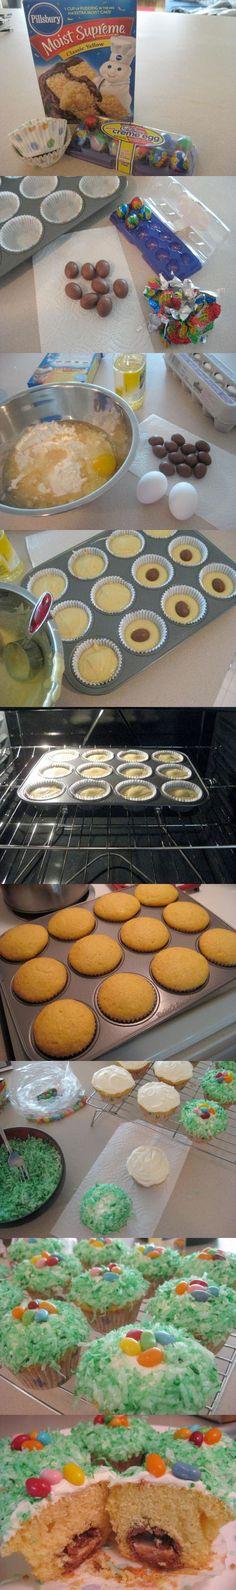 Cadbury Creme Eggs in a Cupcake!